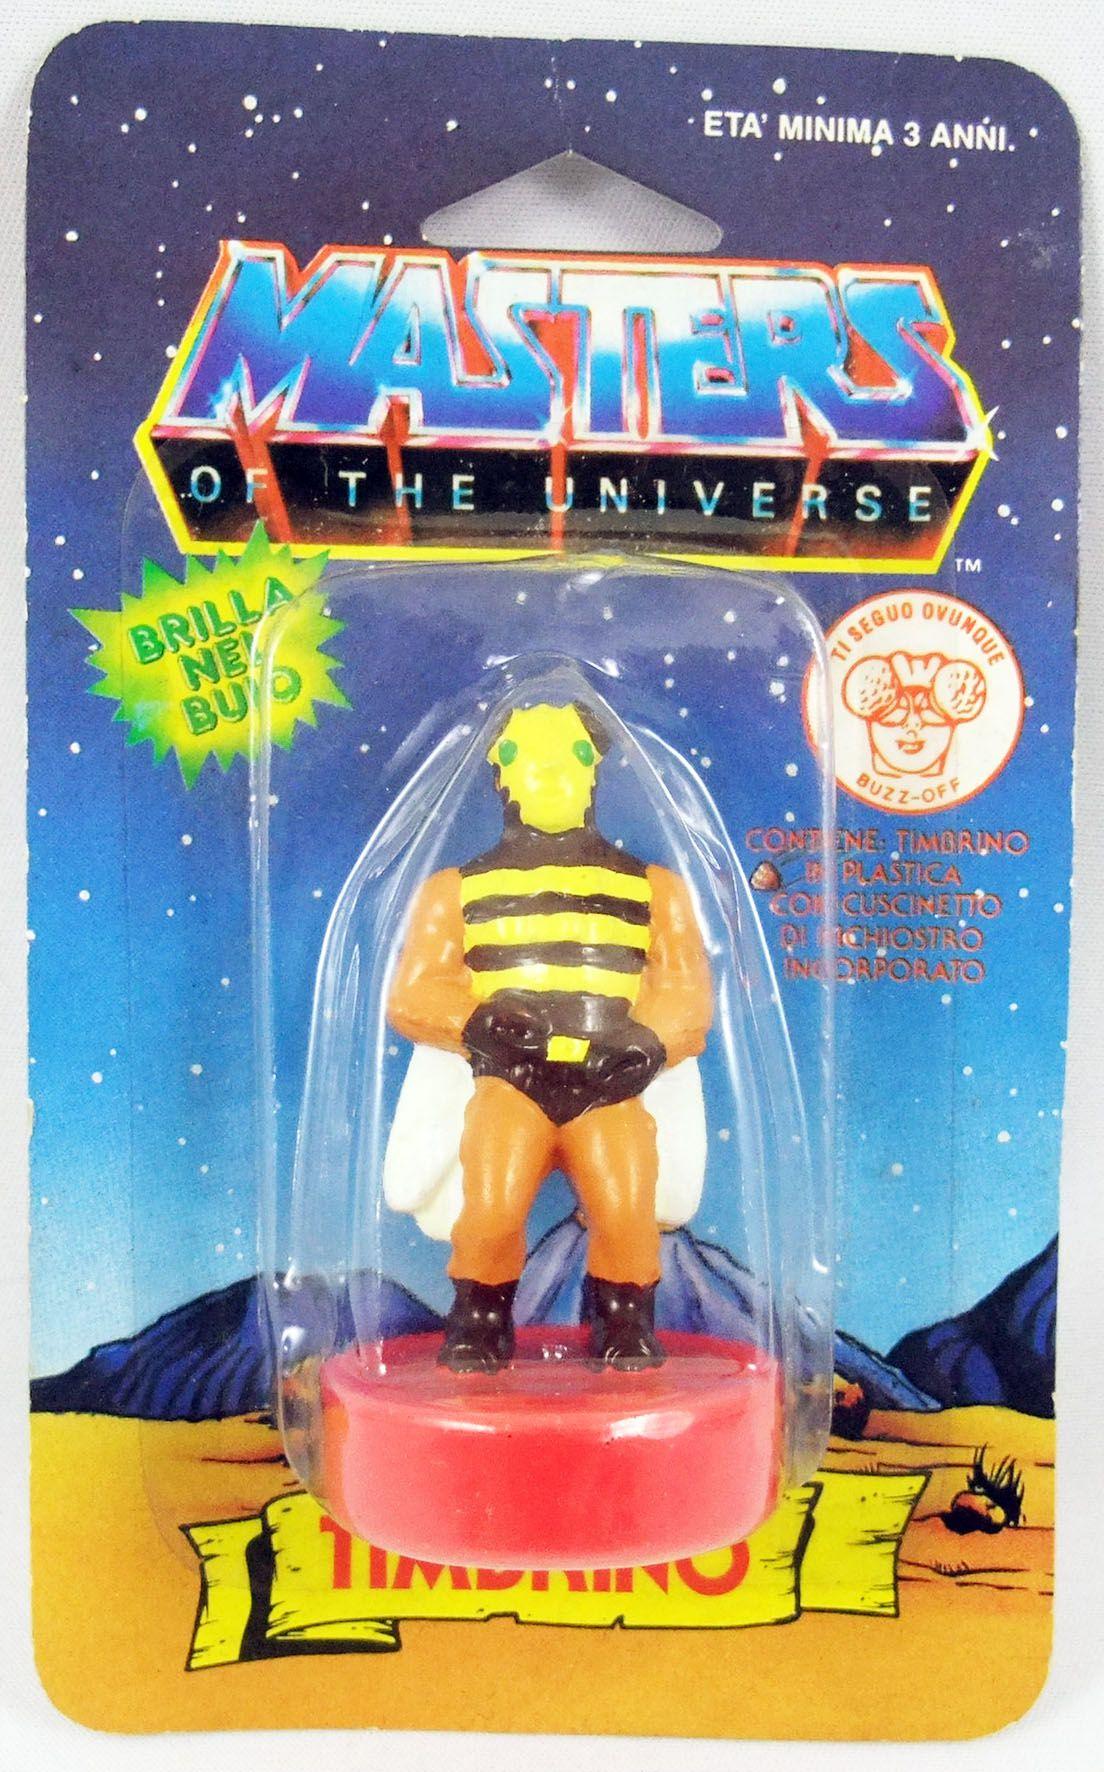 Masters of the Universe - Tampon-encreur - Mattel série 2 - Buzz-Off / Buzz